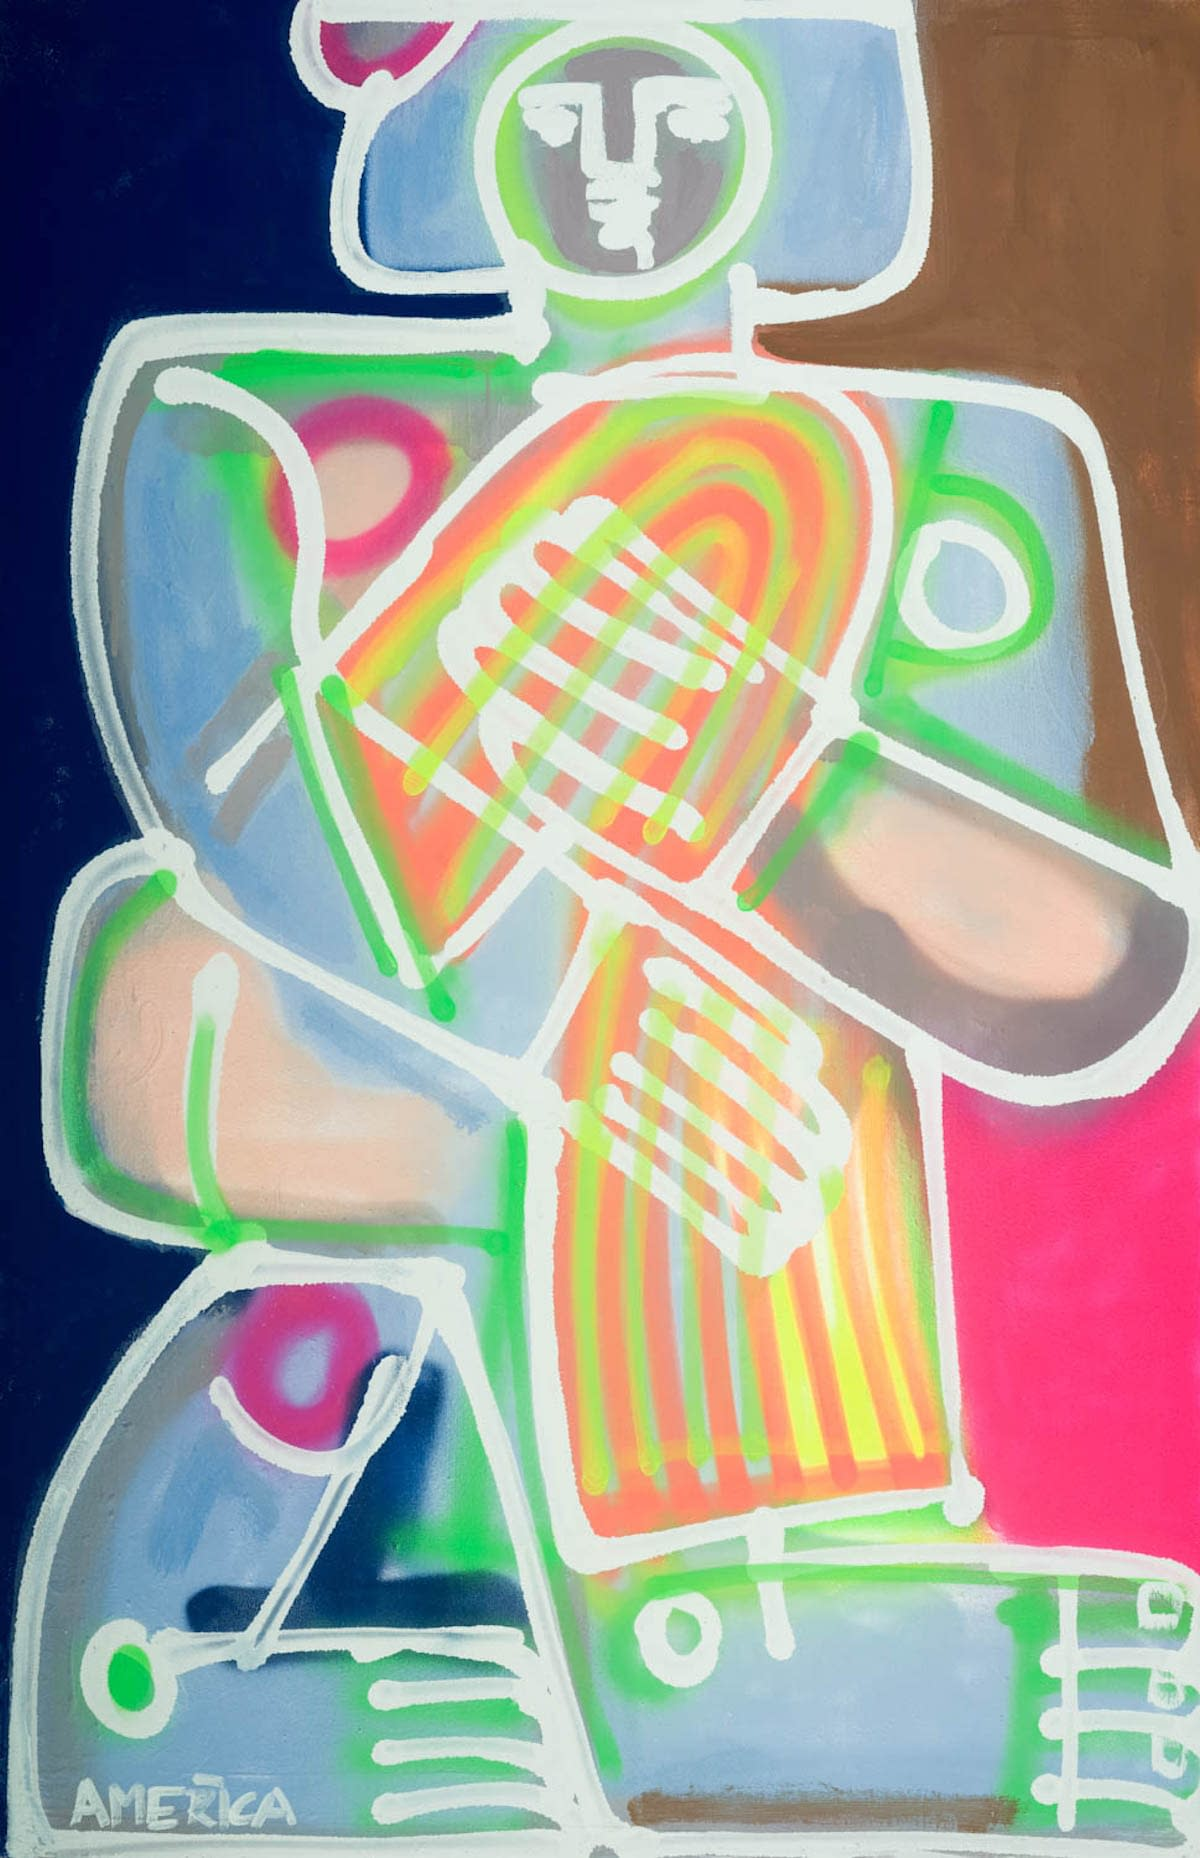 Woman_with_Orange_and_Yellow_Towel-AcrylicSprayPaintCanvas-70.5×46.5-15k